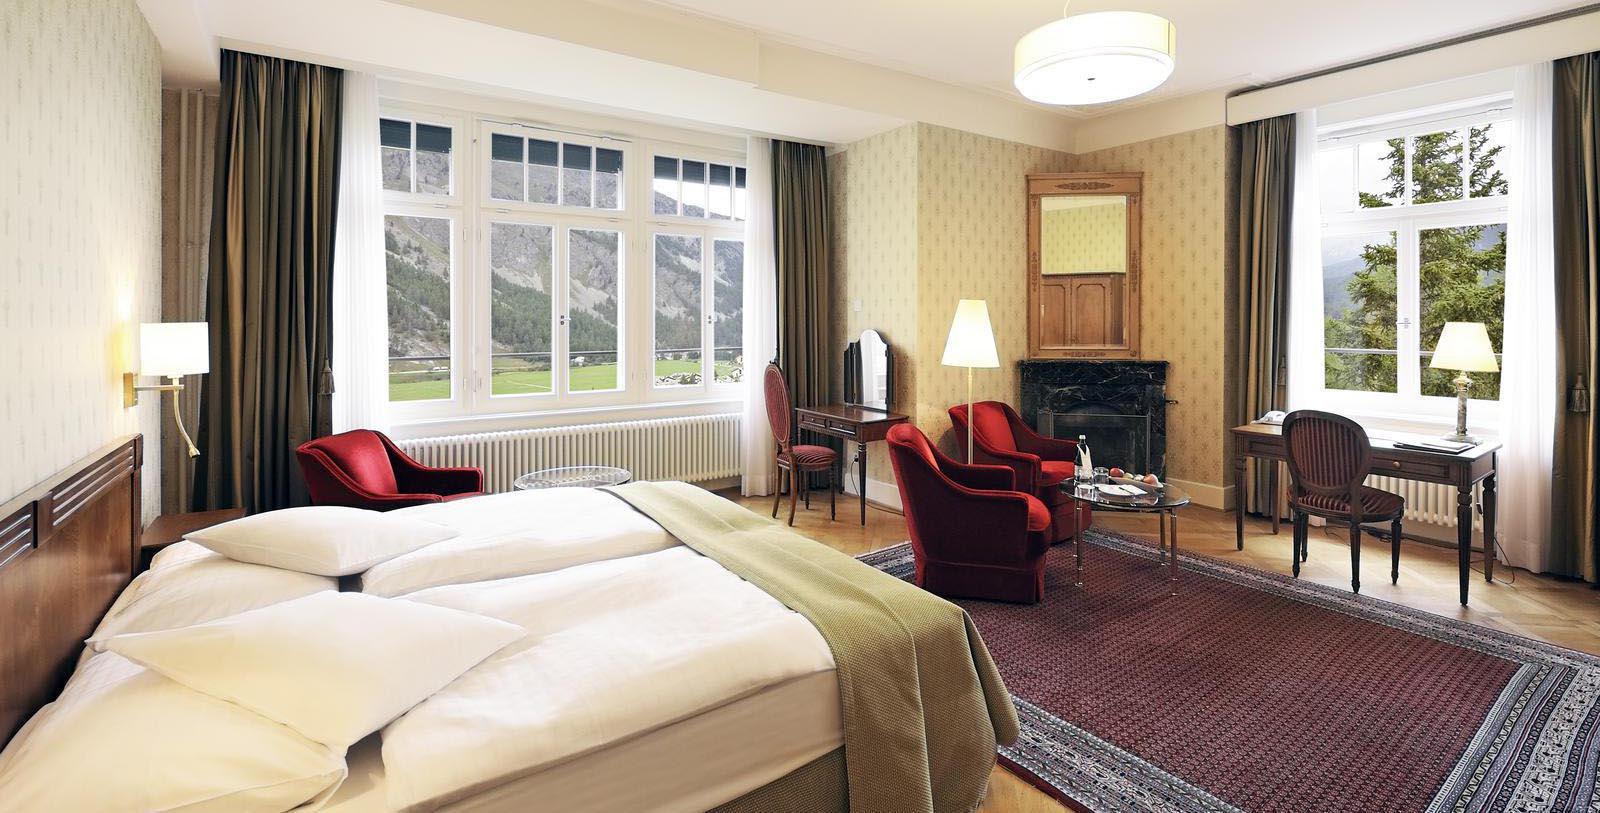 Image of Guestromm Interior Waldhaus Sils, 1908, Member of Historic Hotels Worldwide, in Sils Maria, Switzerland, Location